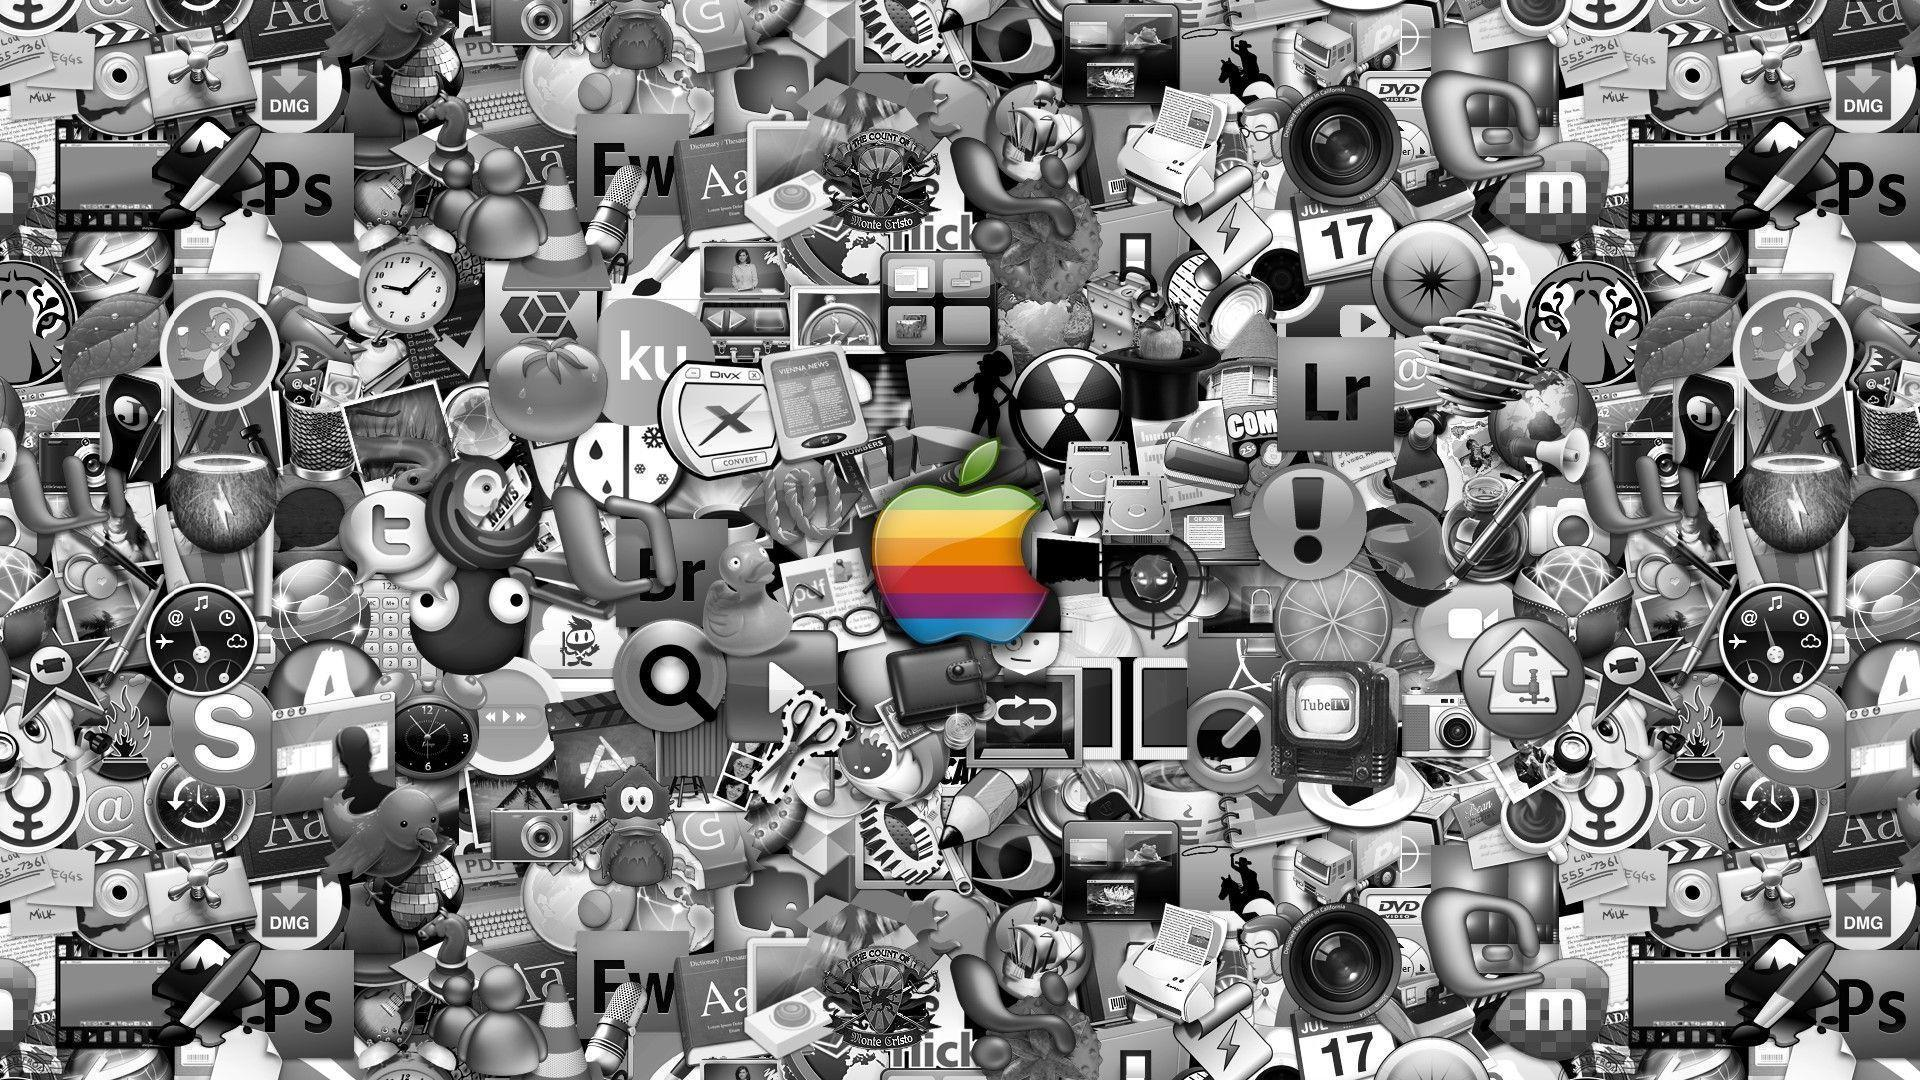 Cool Wallpaper For Mac